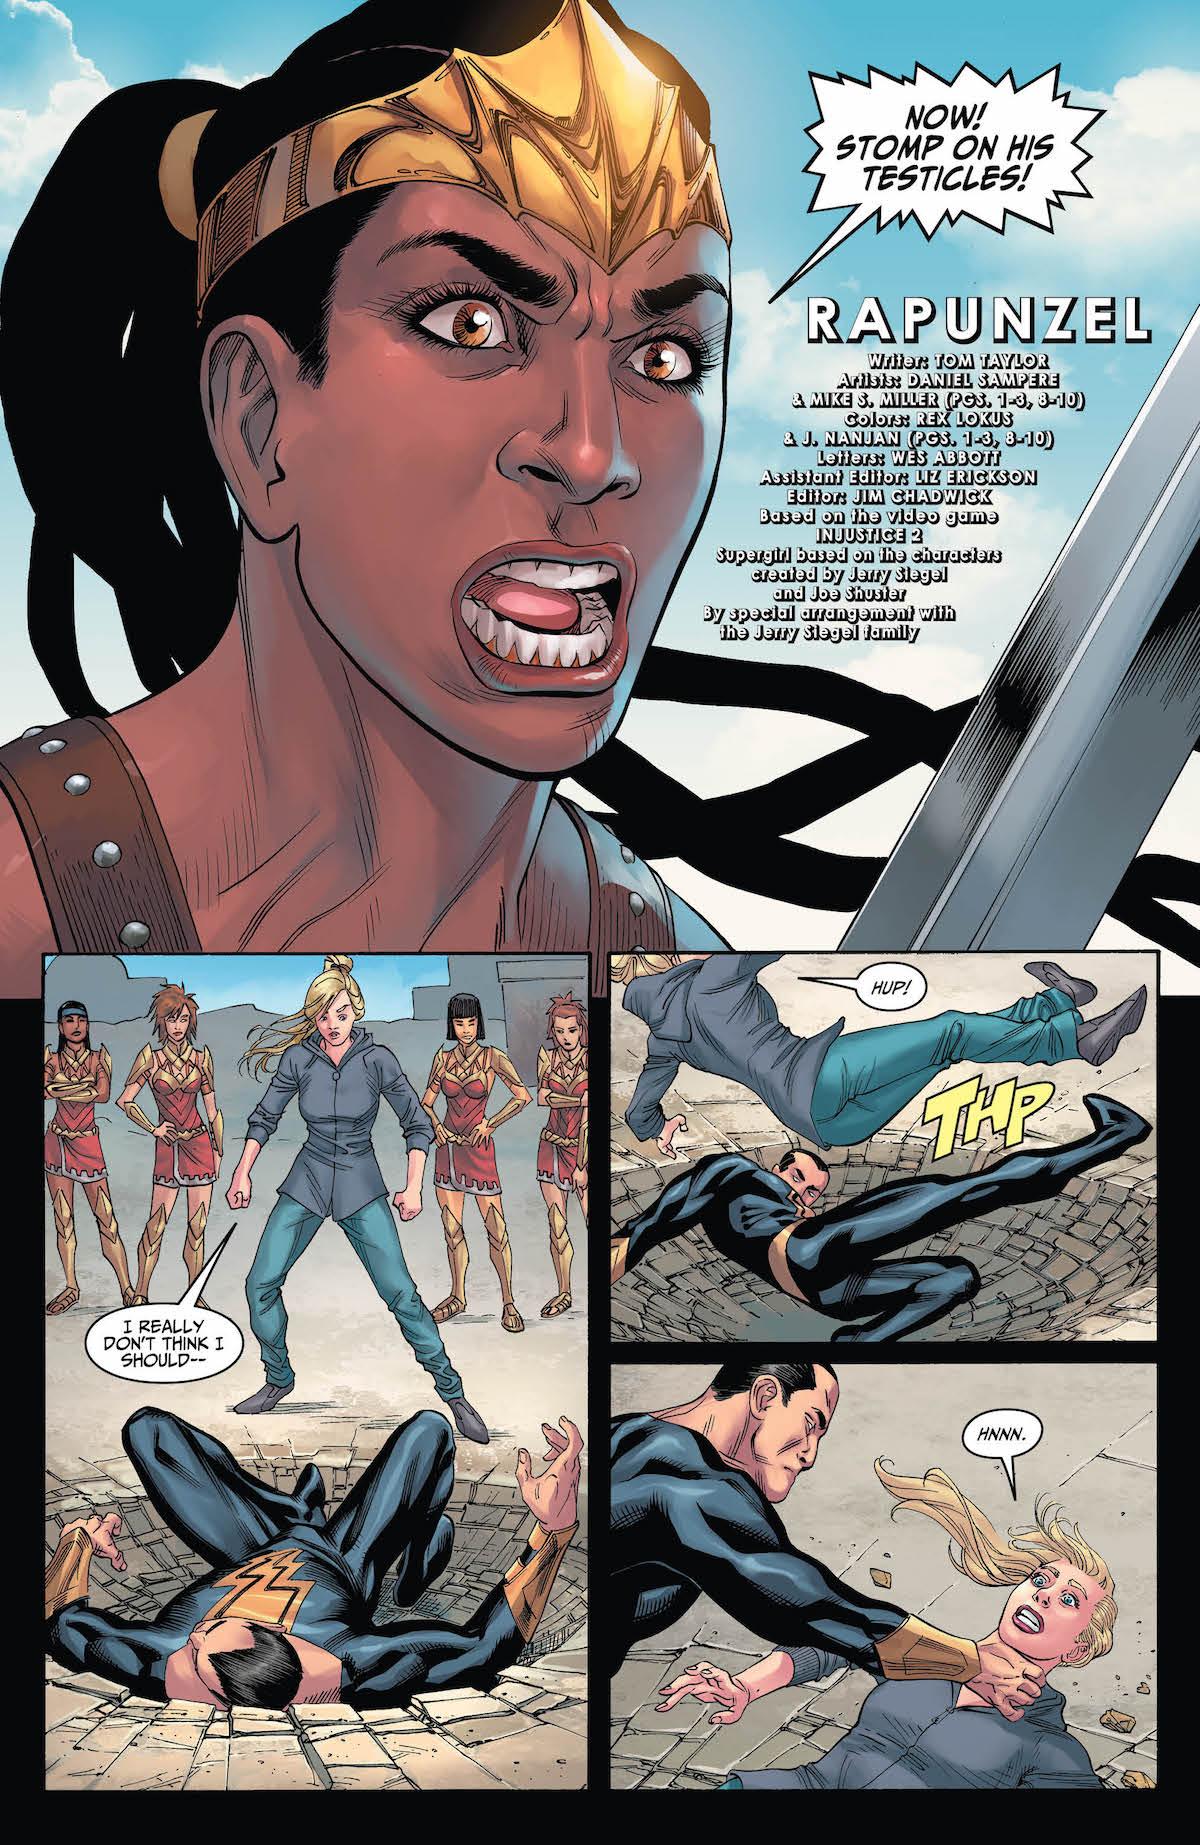 Injustice 2 #21